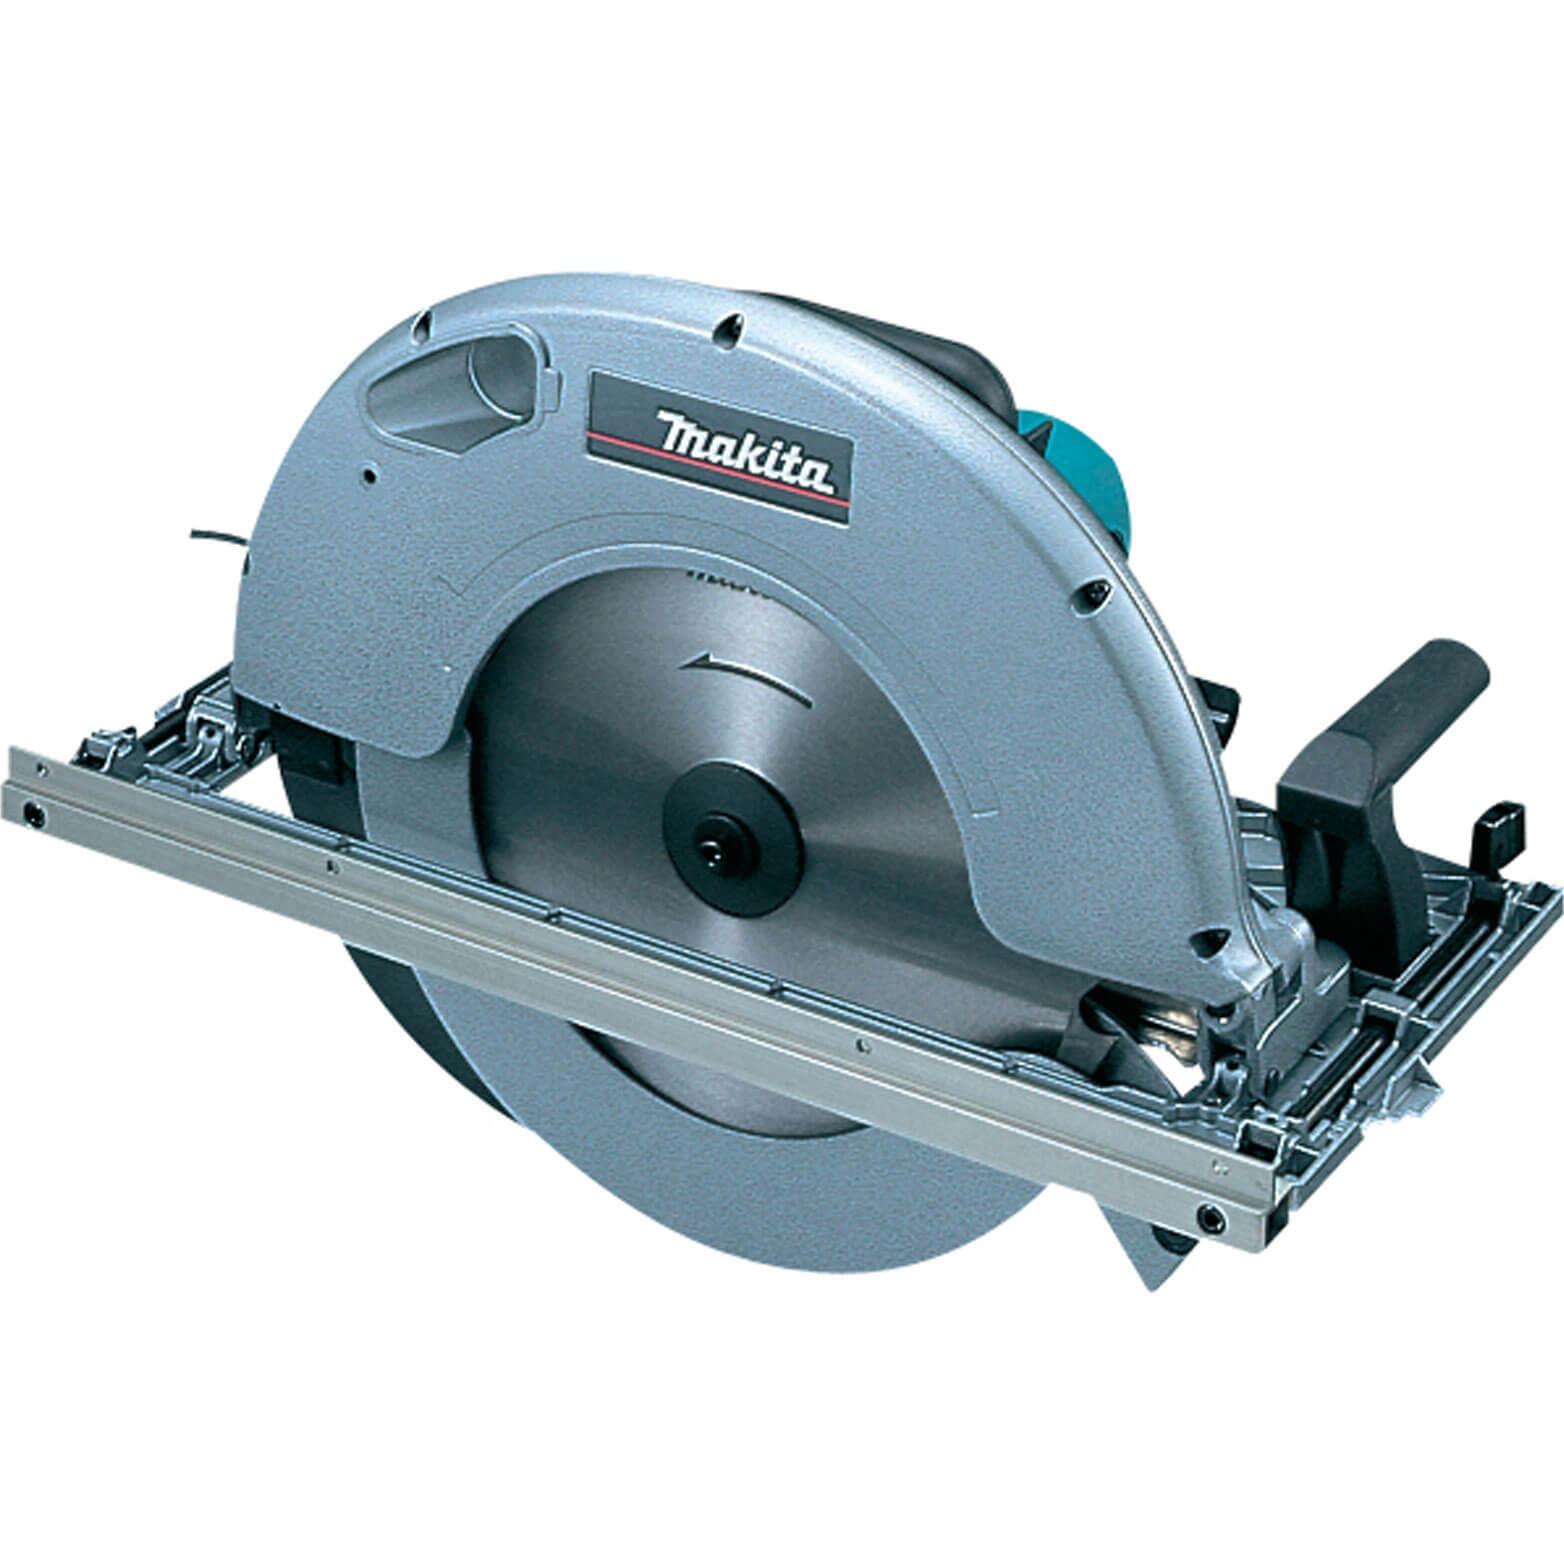 Makita 5143R Circular Saw 355mm 240v